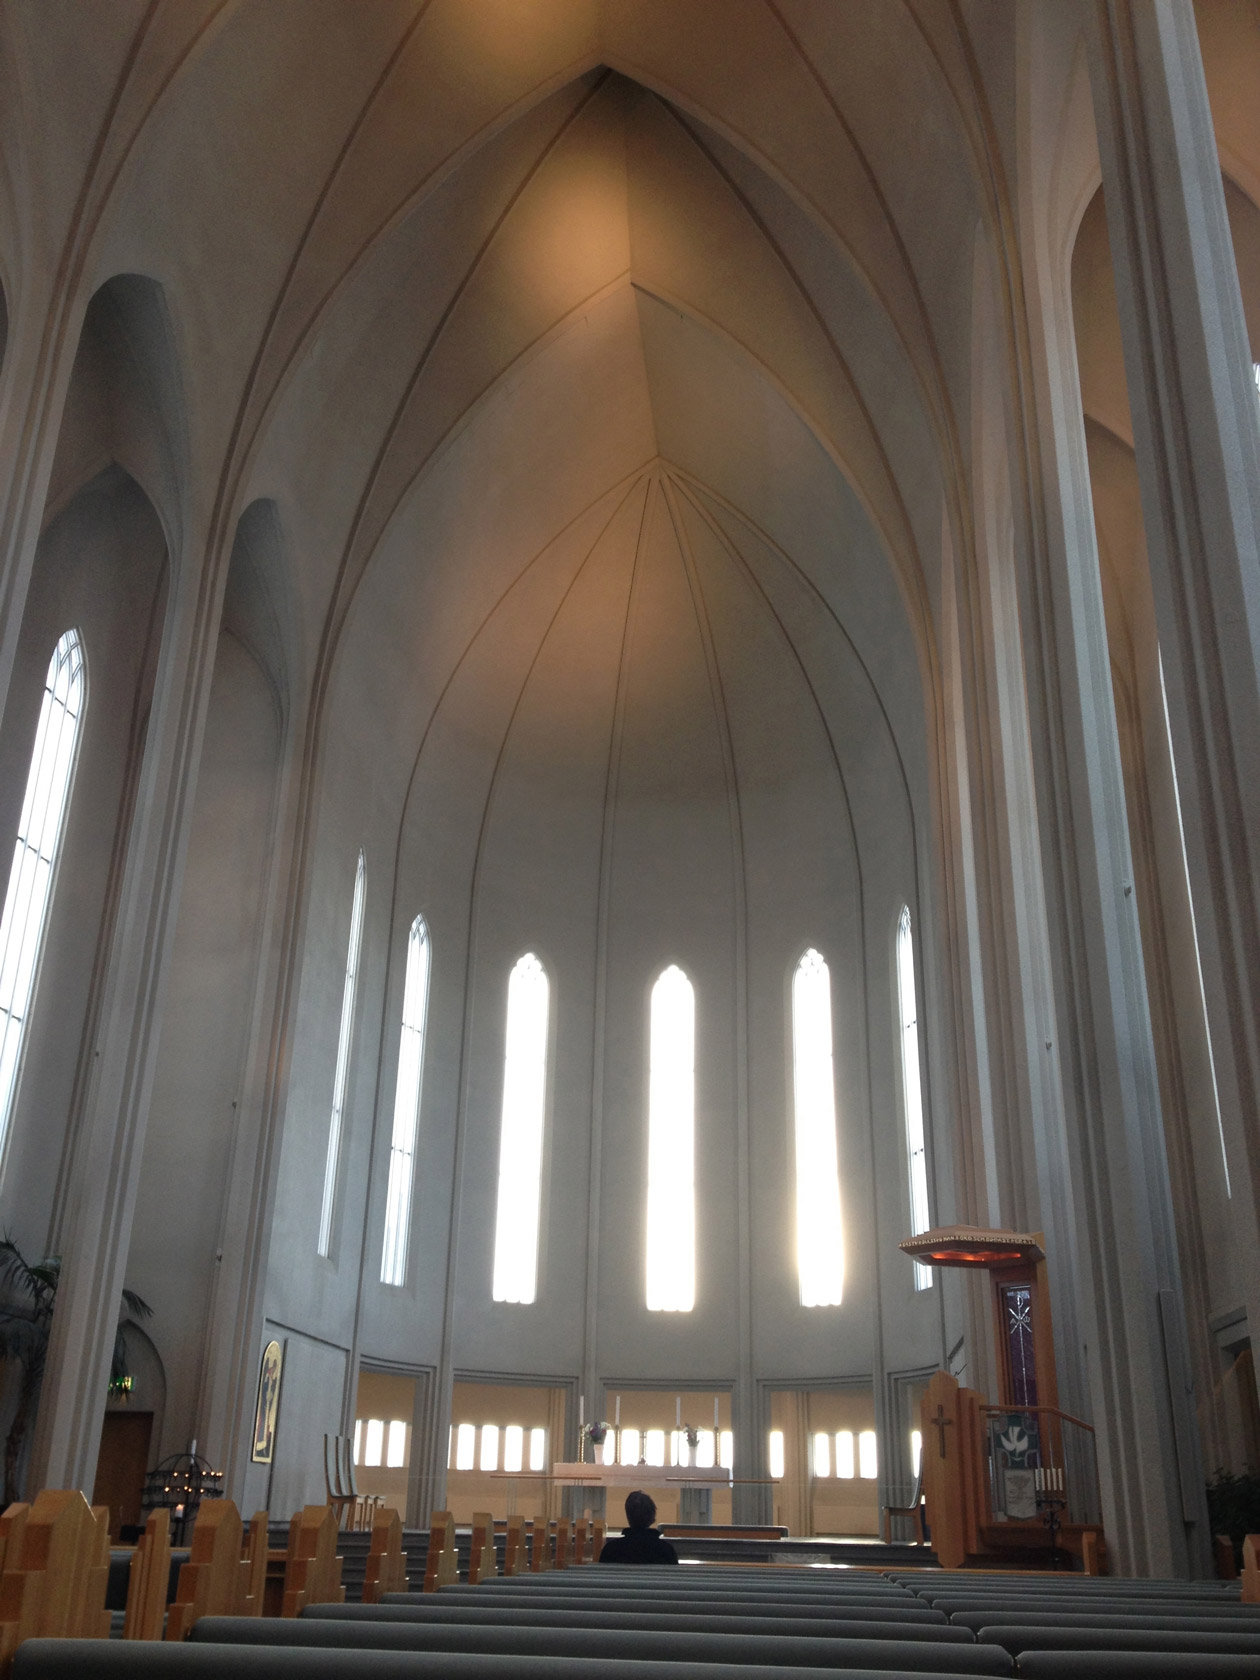 Inside Hallgrímskirkja. It's very peaceful.